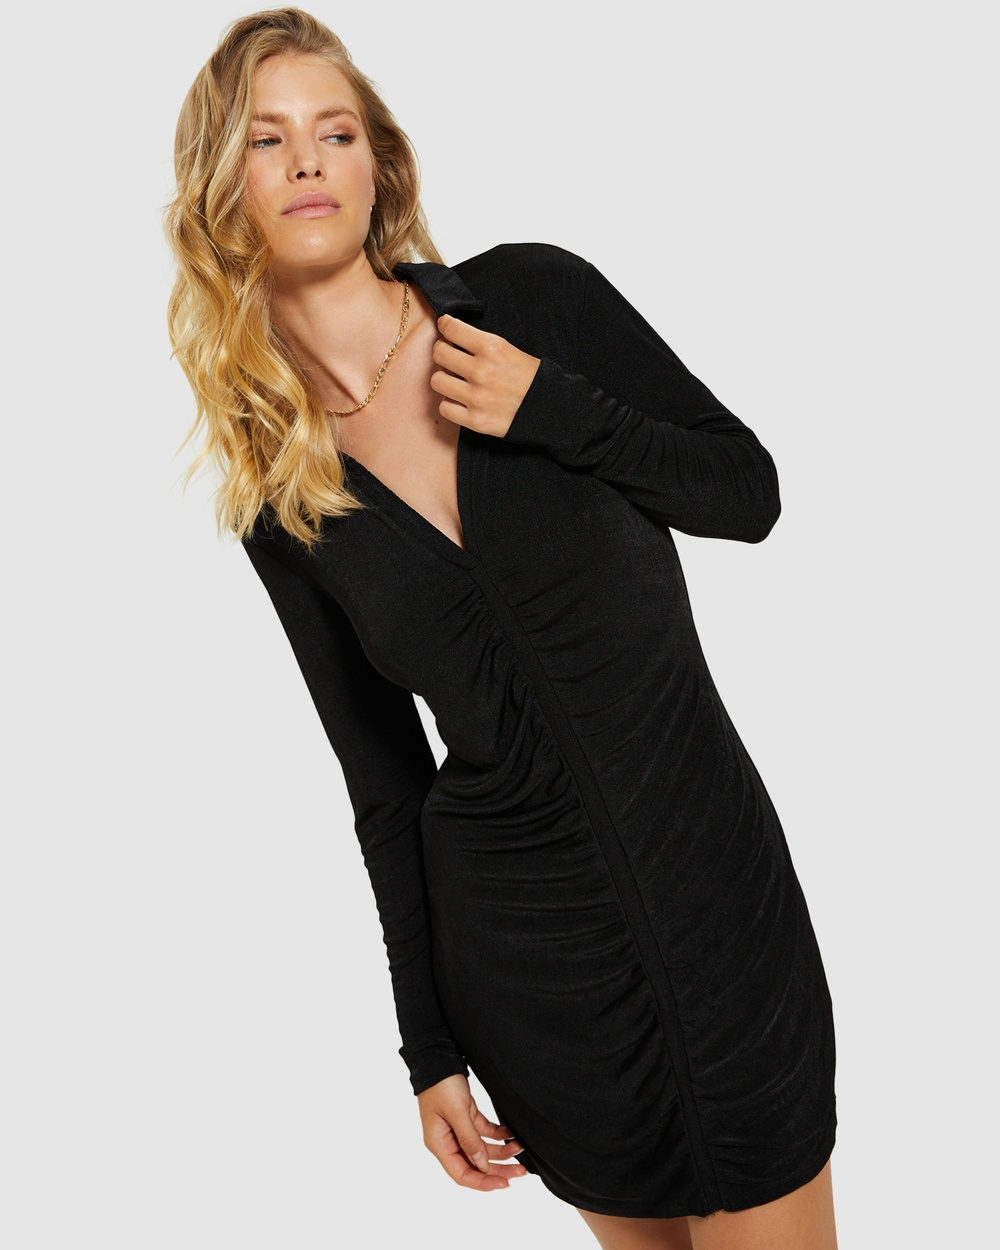 Alice In The Eve Savannah Slinky Shirt Dress Dresses BLACK